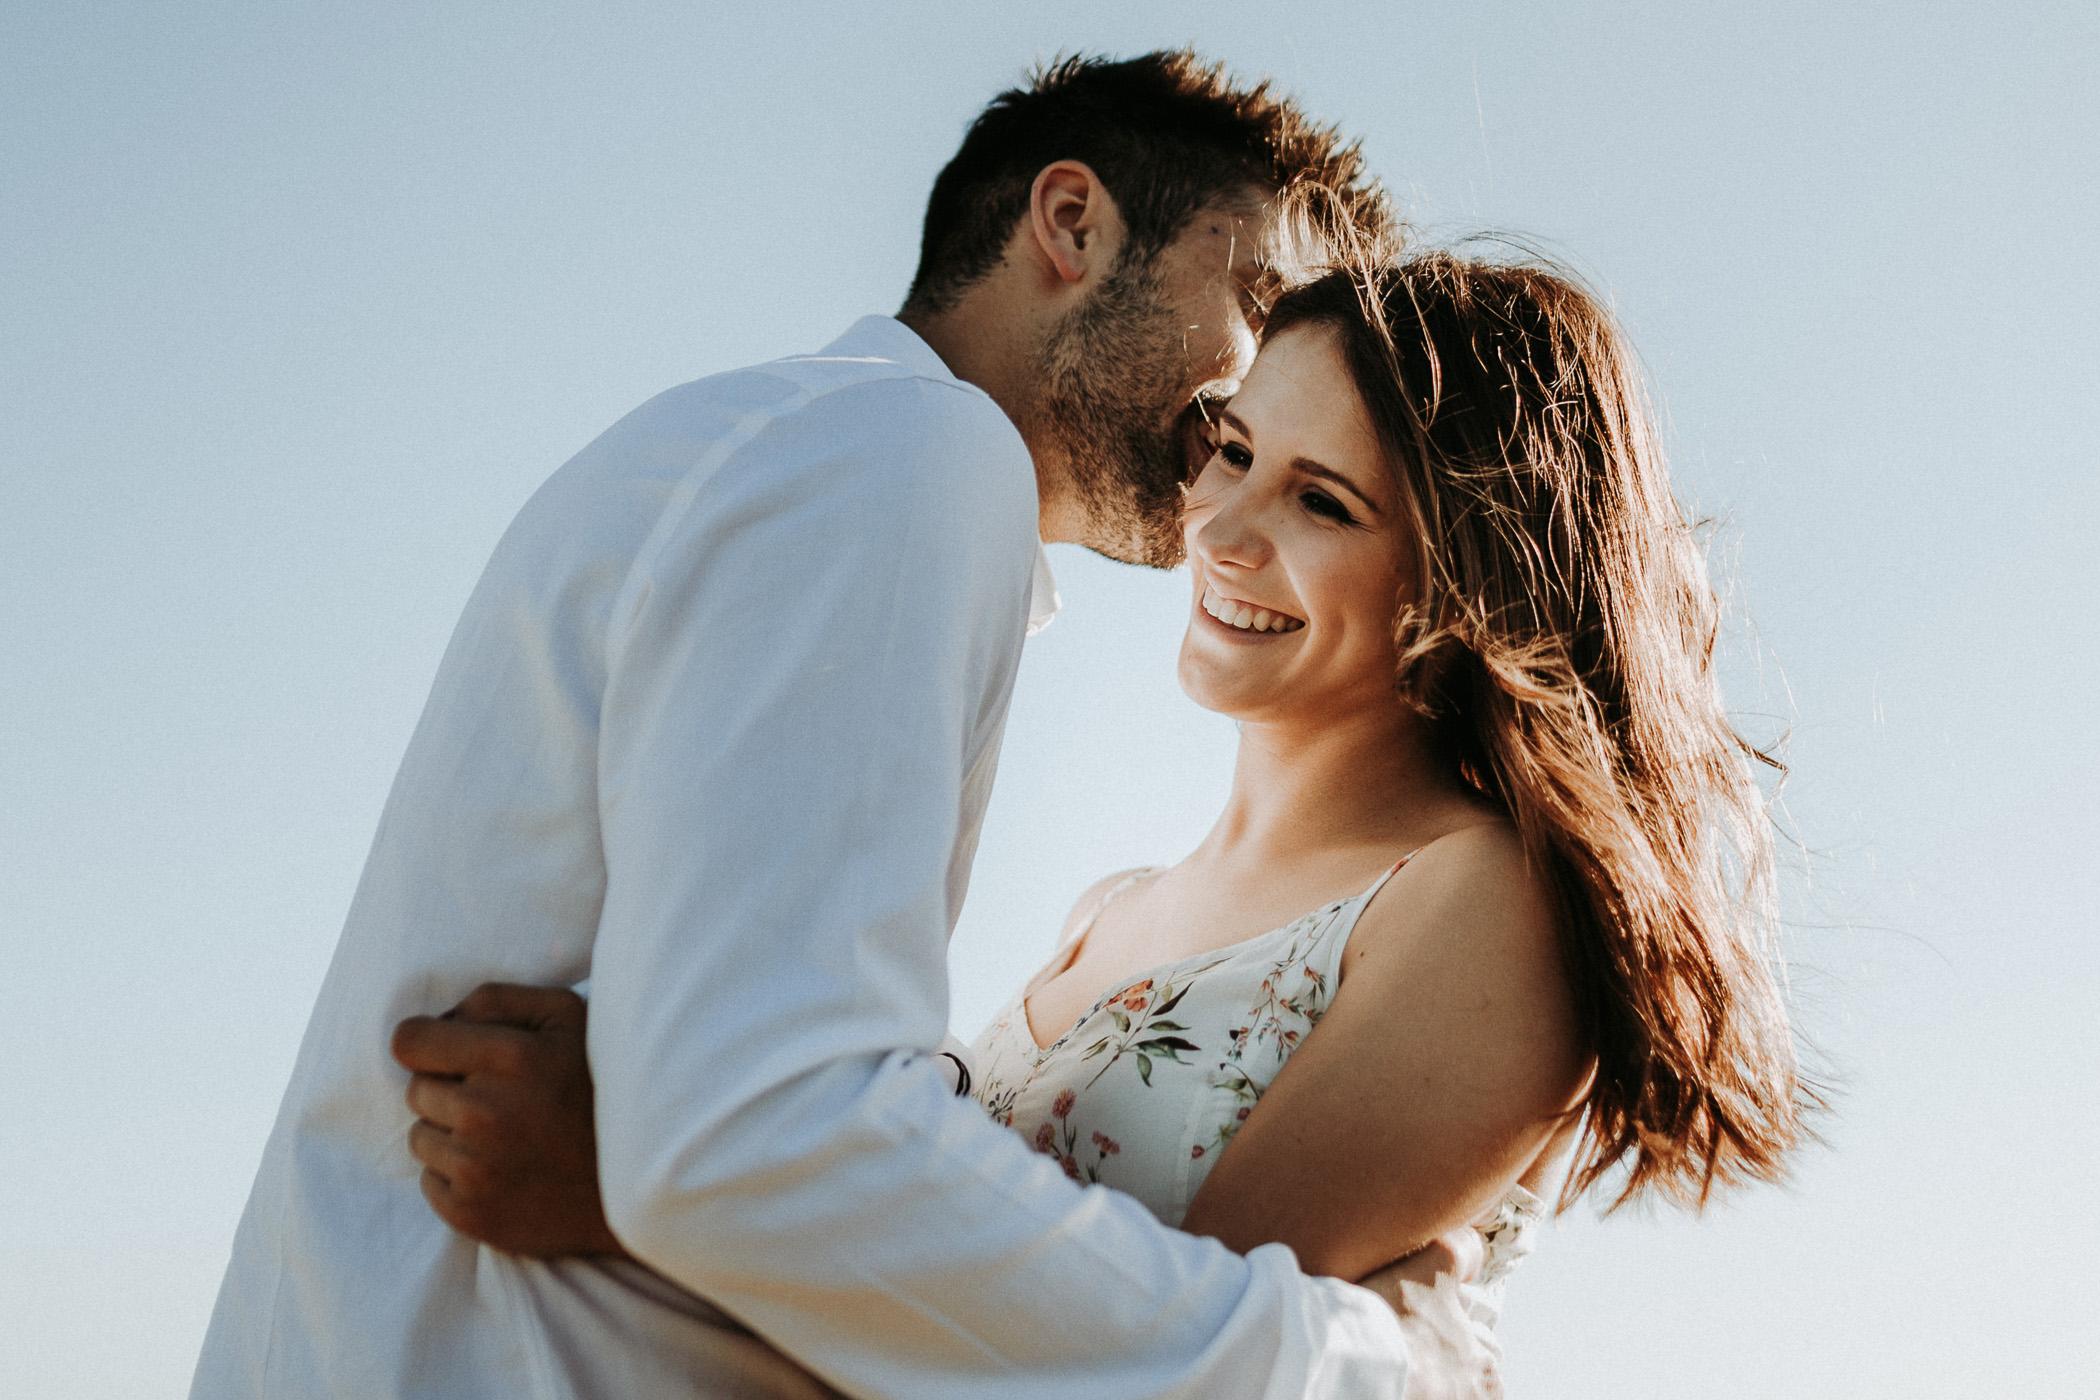 DanielaMarquardtPhotography_wedding_elopement_mallorca_spain_calapi_palma_lauraandtoni_257